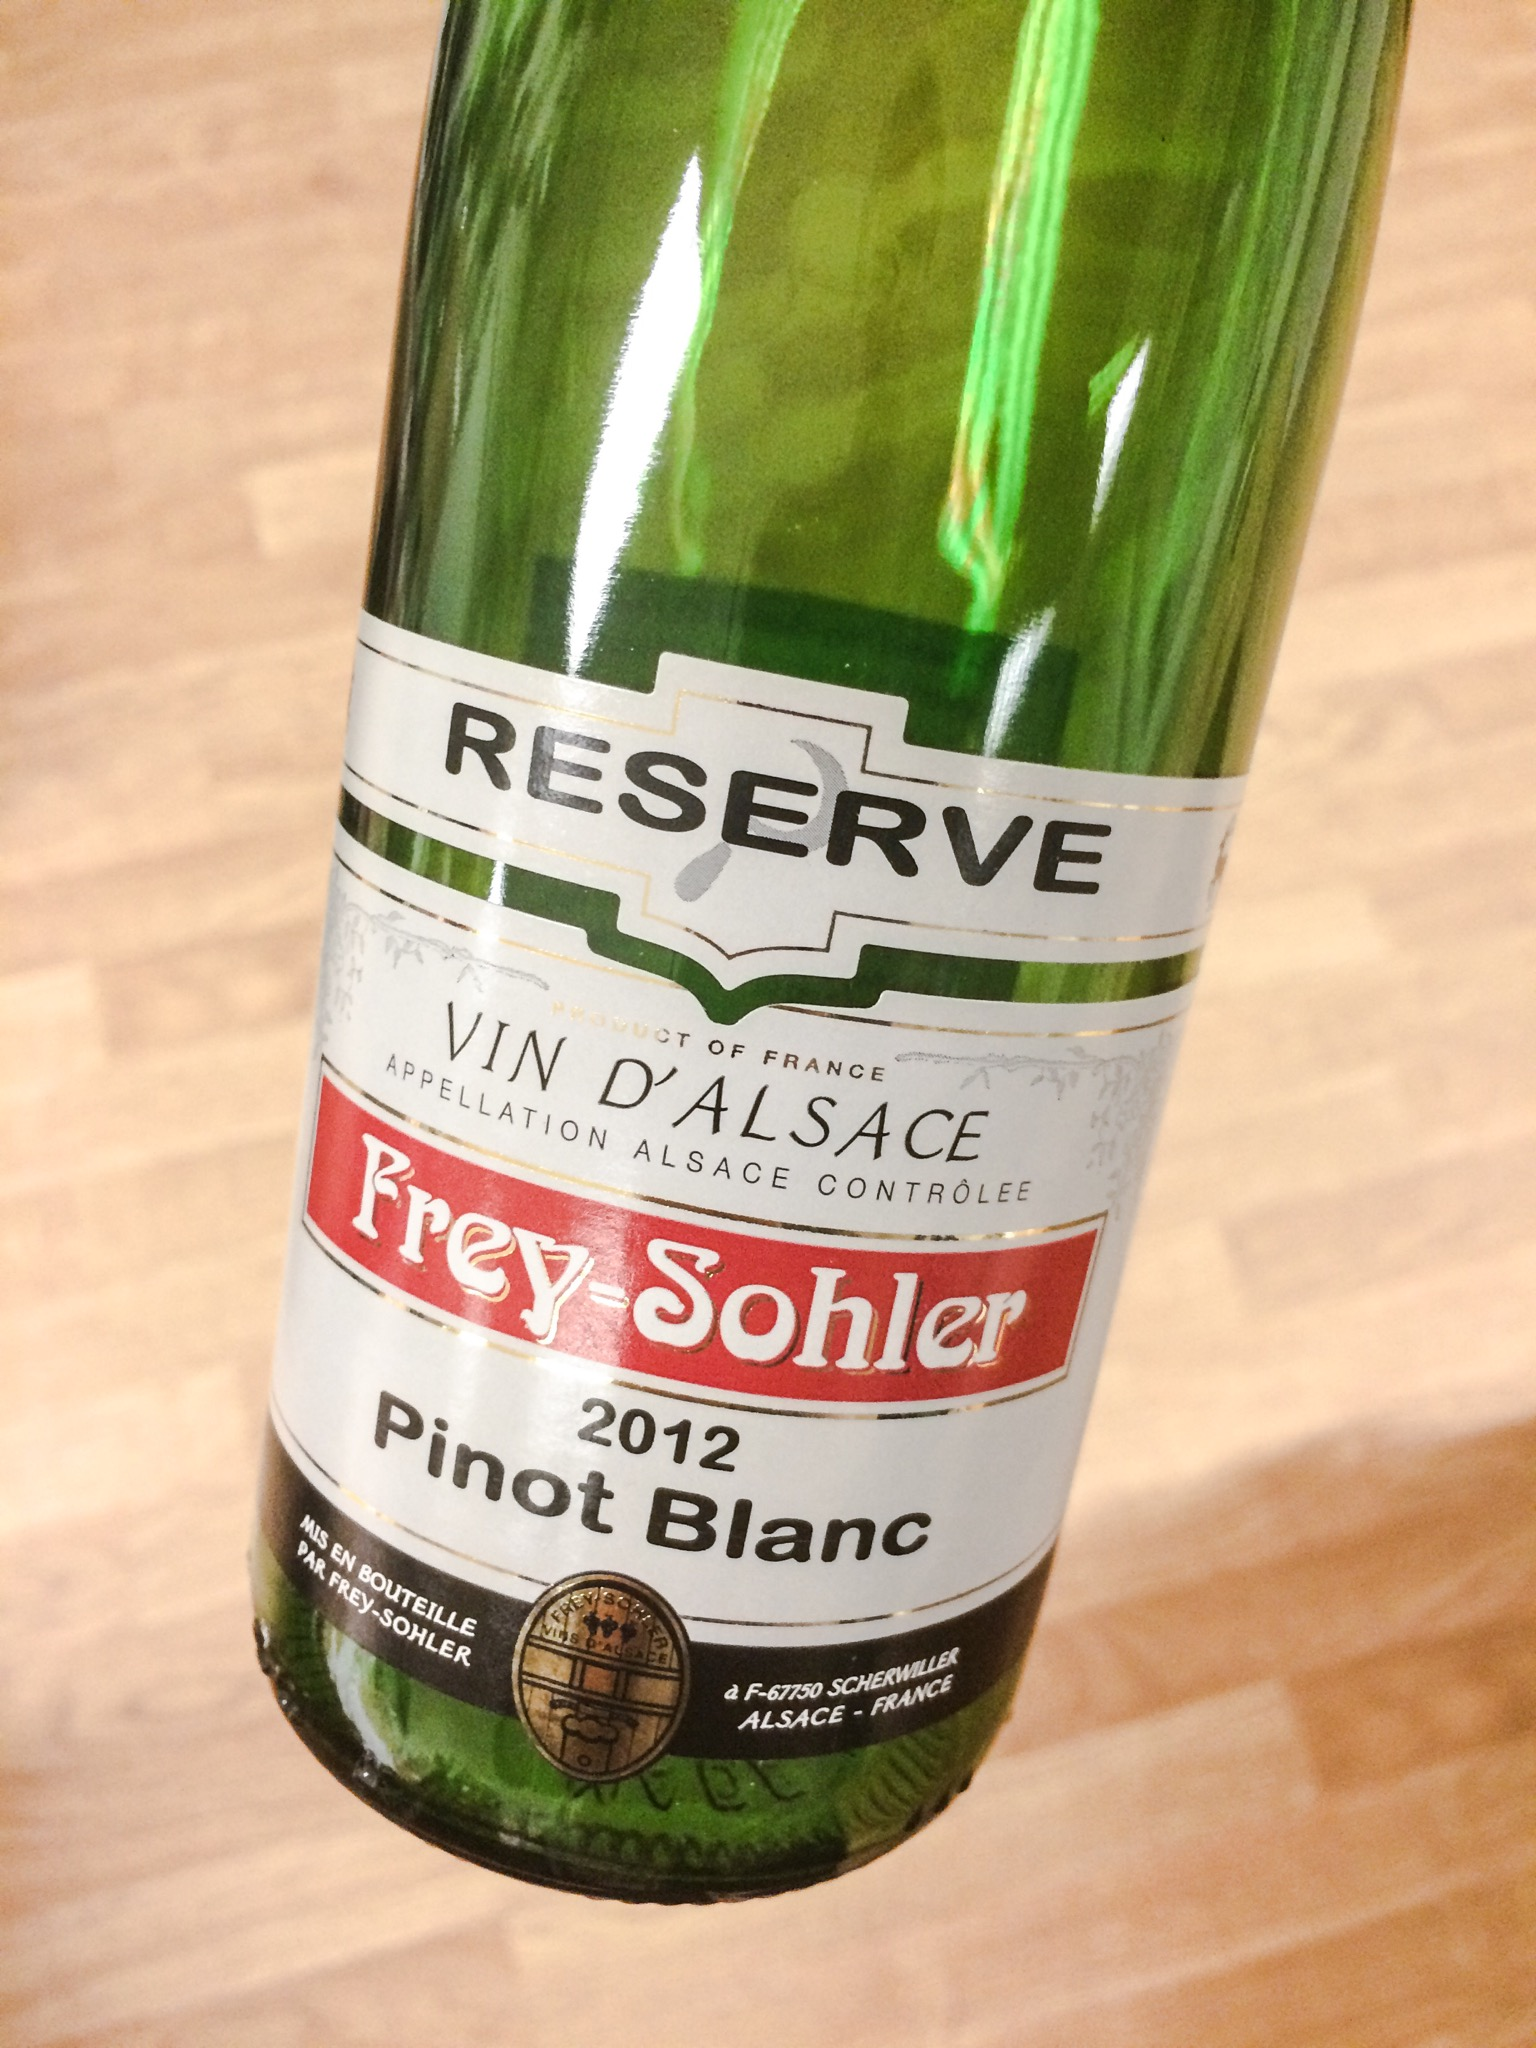 Frey-Sohler Reserve Pinot Blanc, 2012